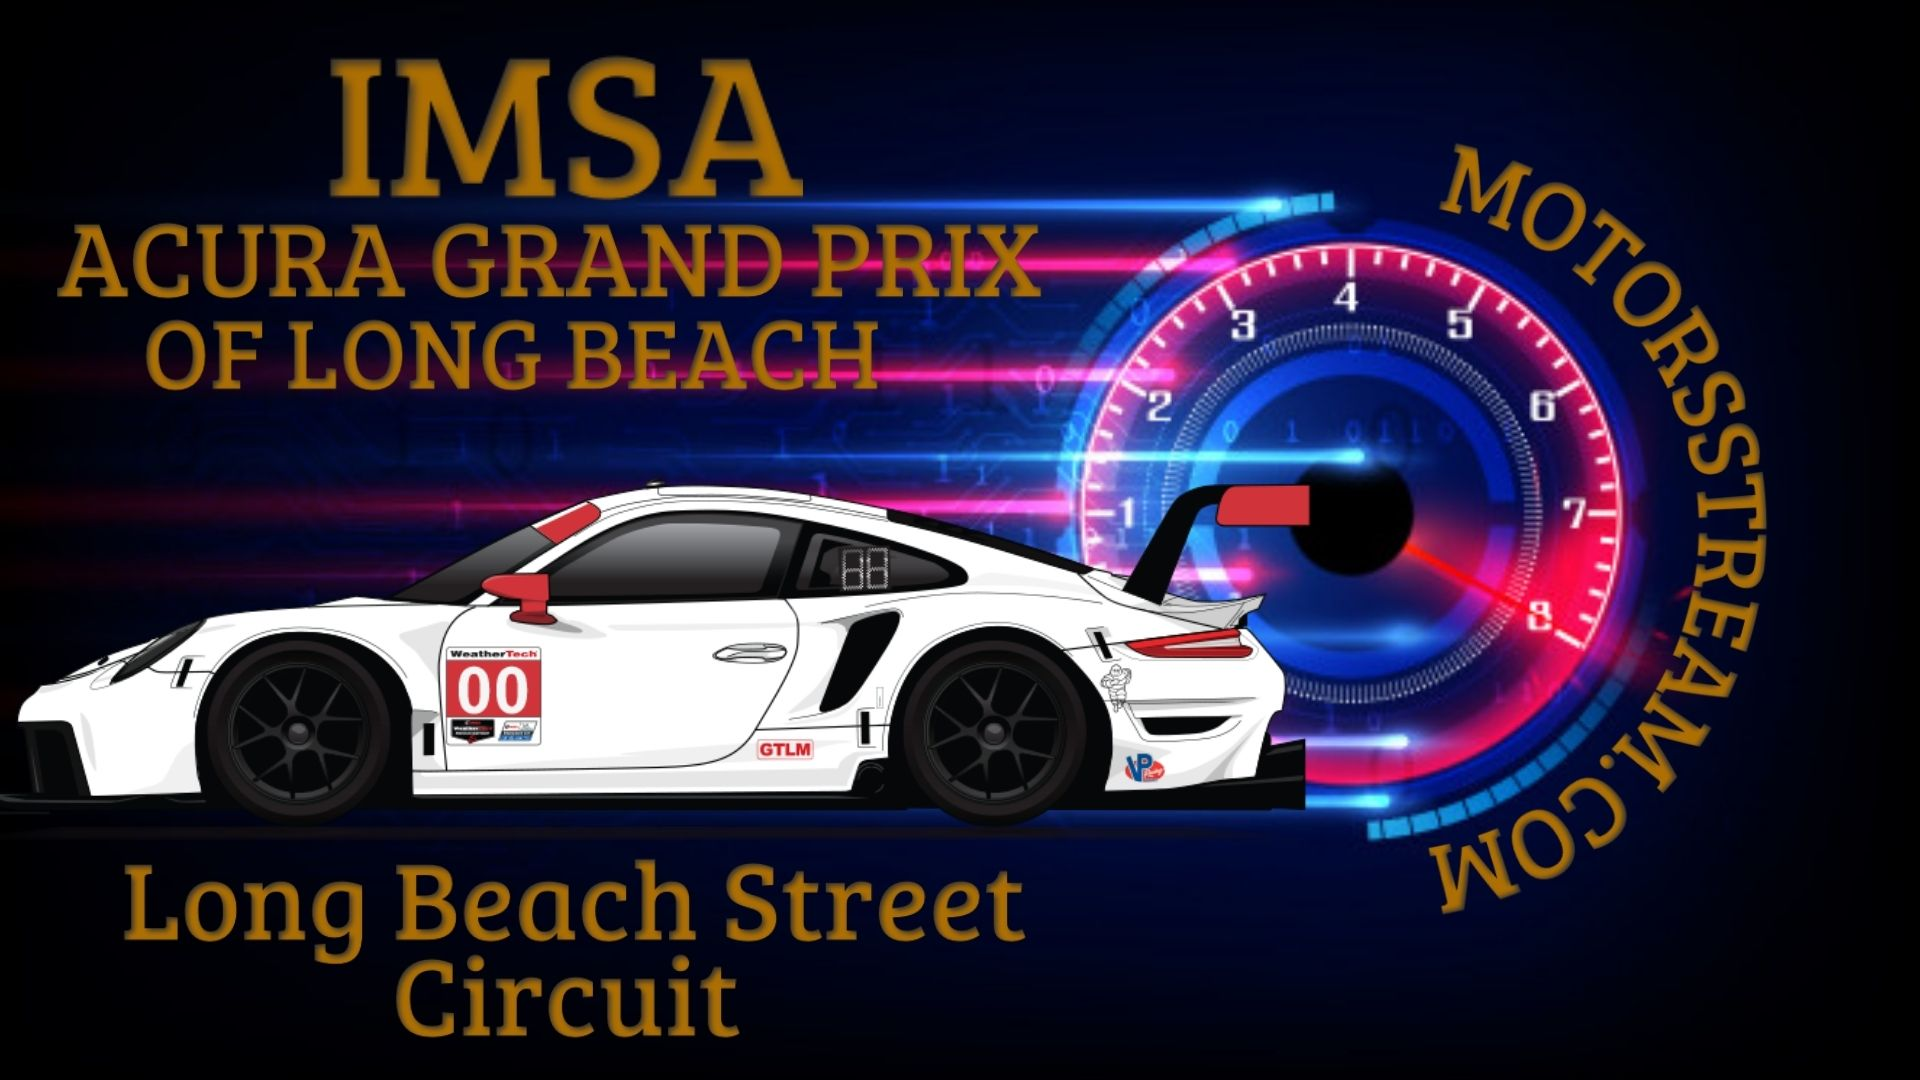 Acura Grand Prix Of Long Beach IMSA | Live Stream 2021